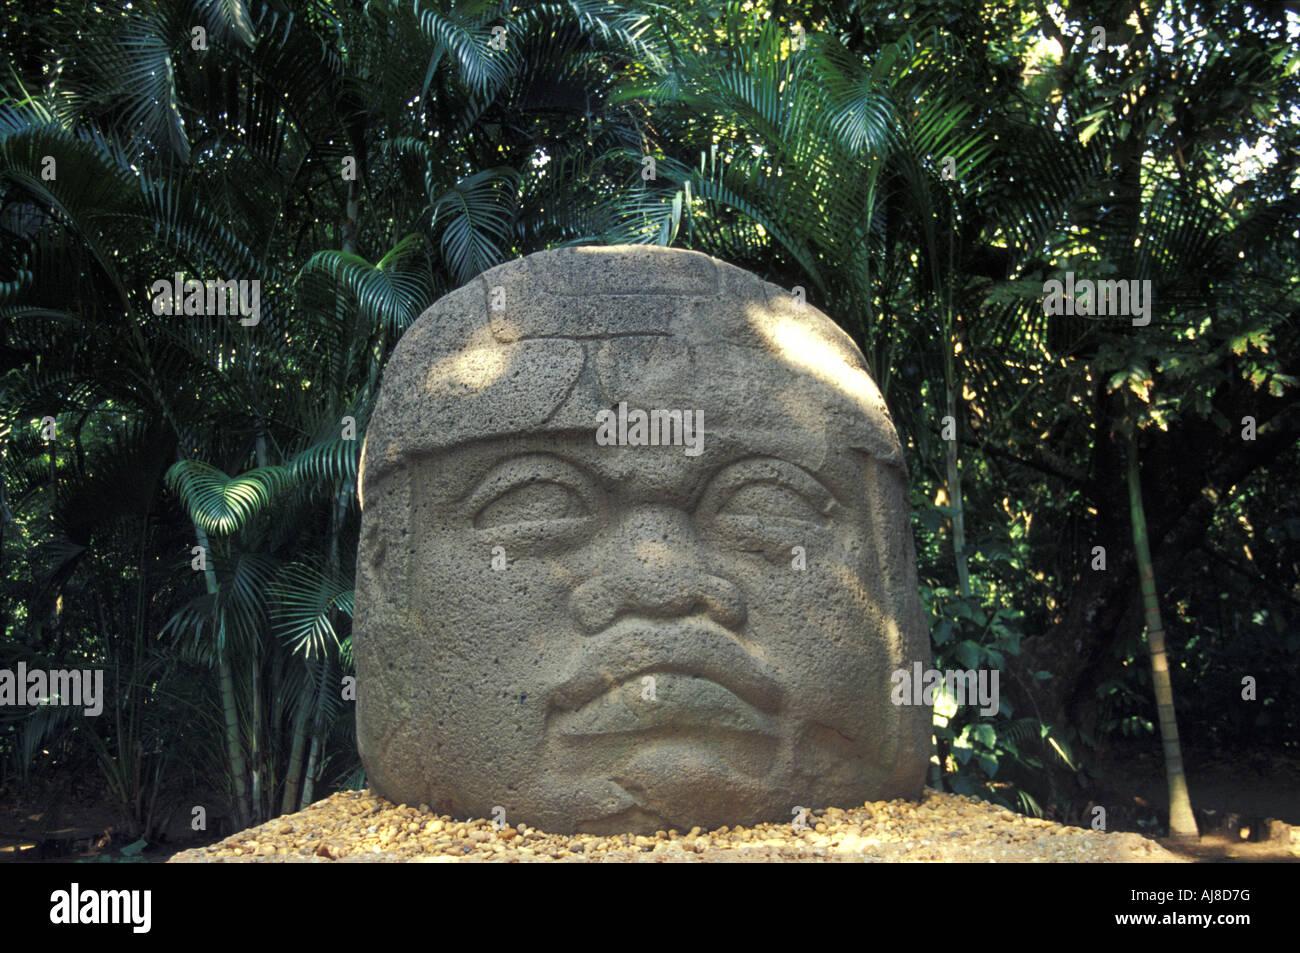 Colossal Olmec head, Monument 1, Parque Museo La Venta , Villahermosa, Mexico - Stock Image